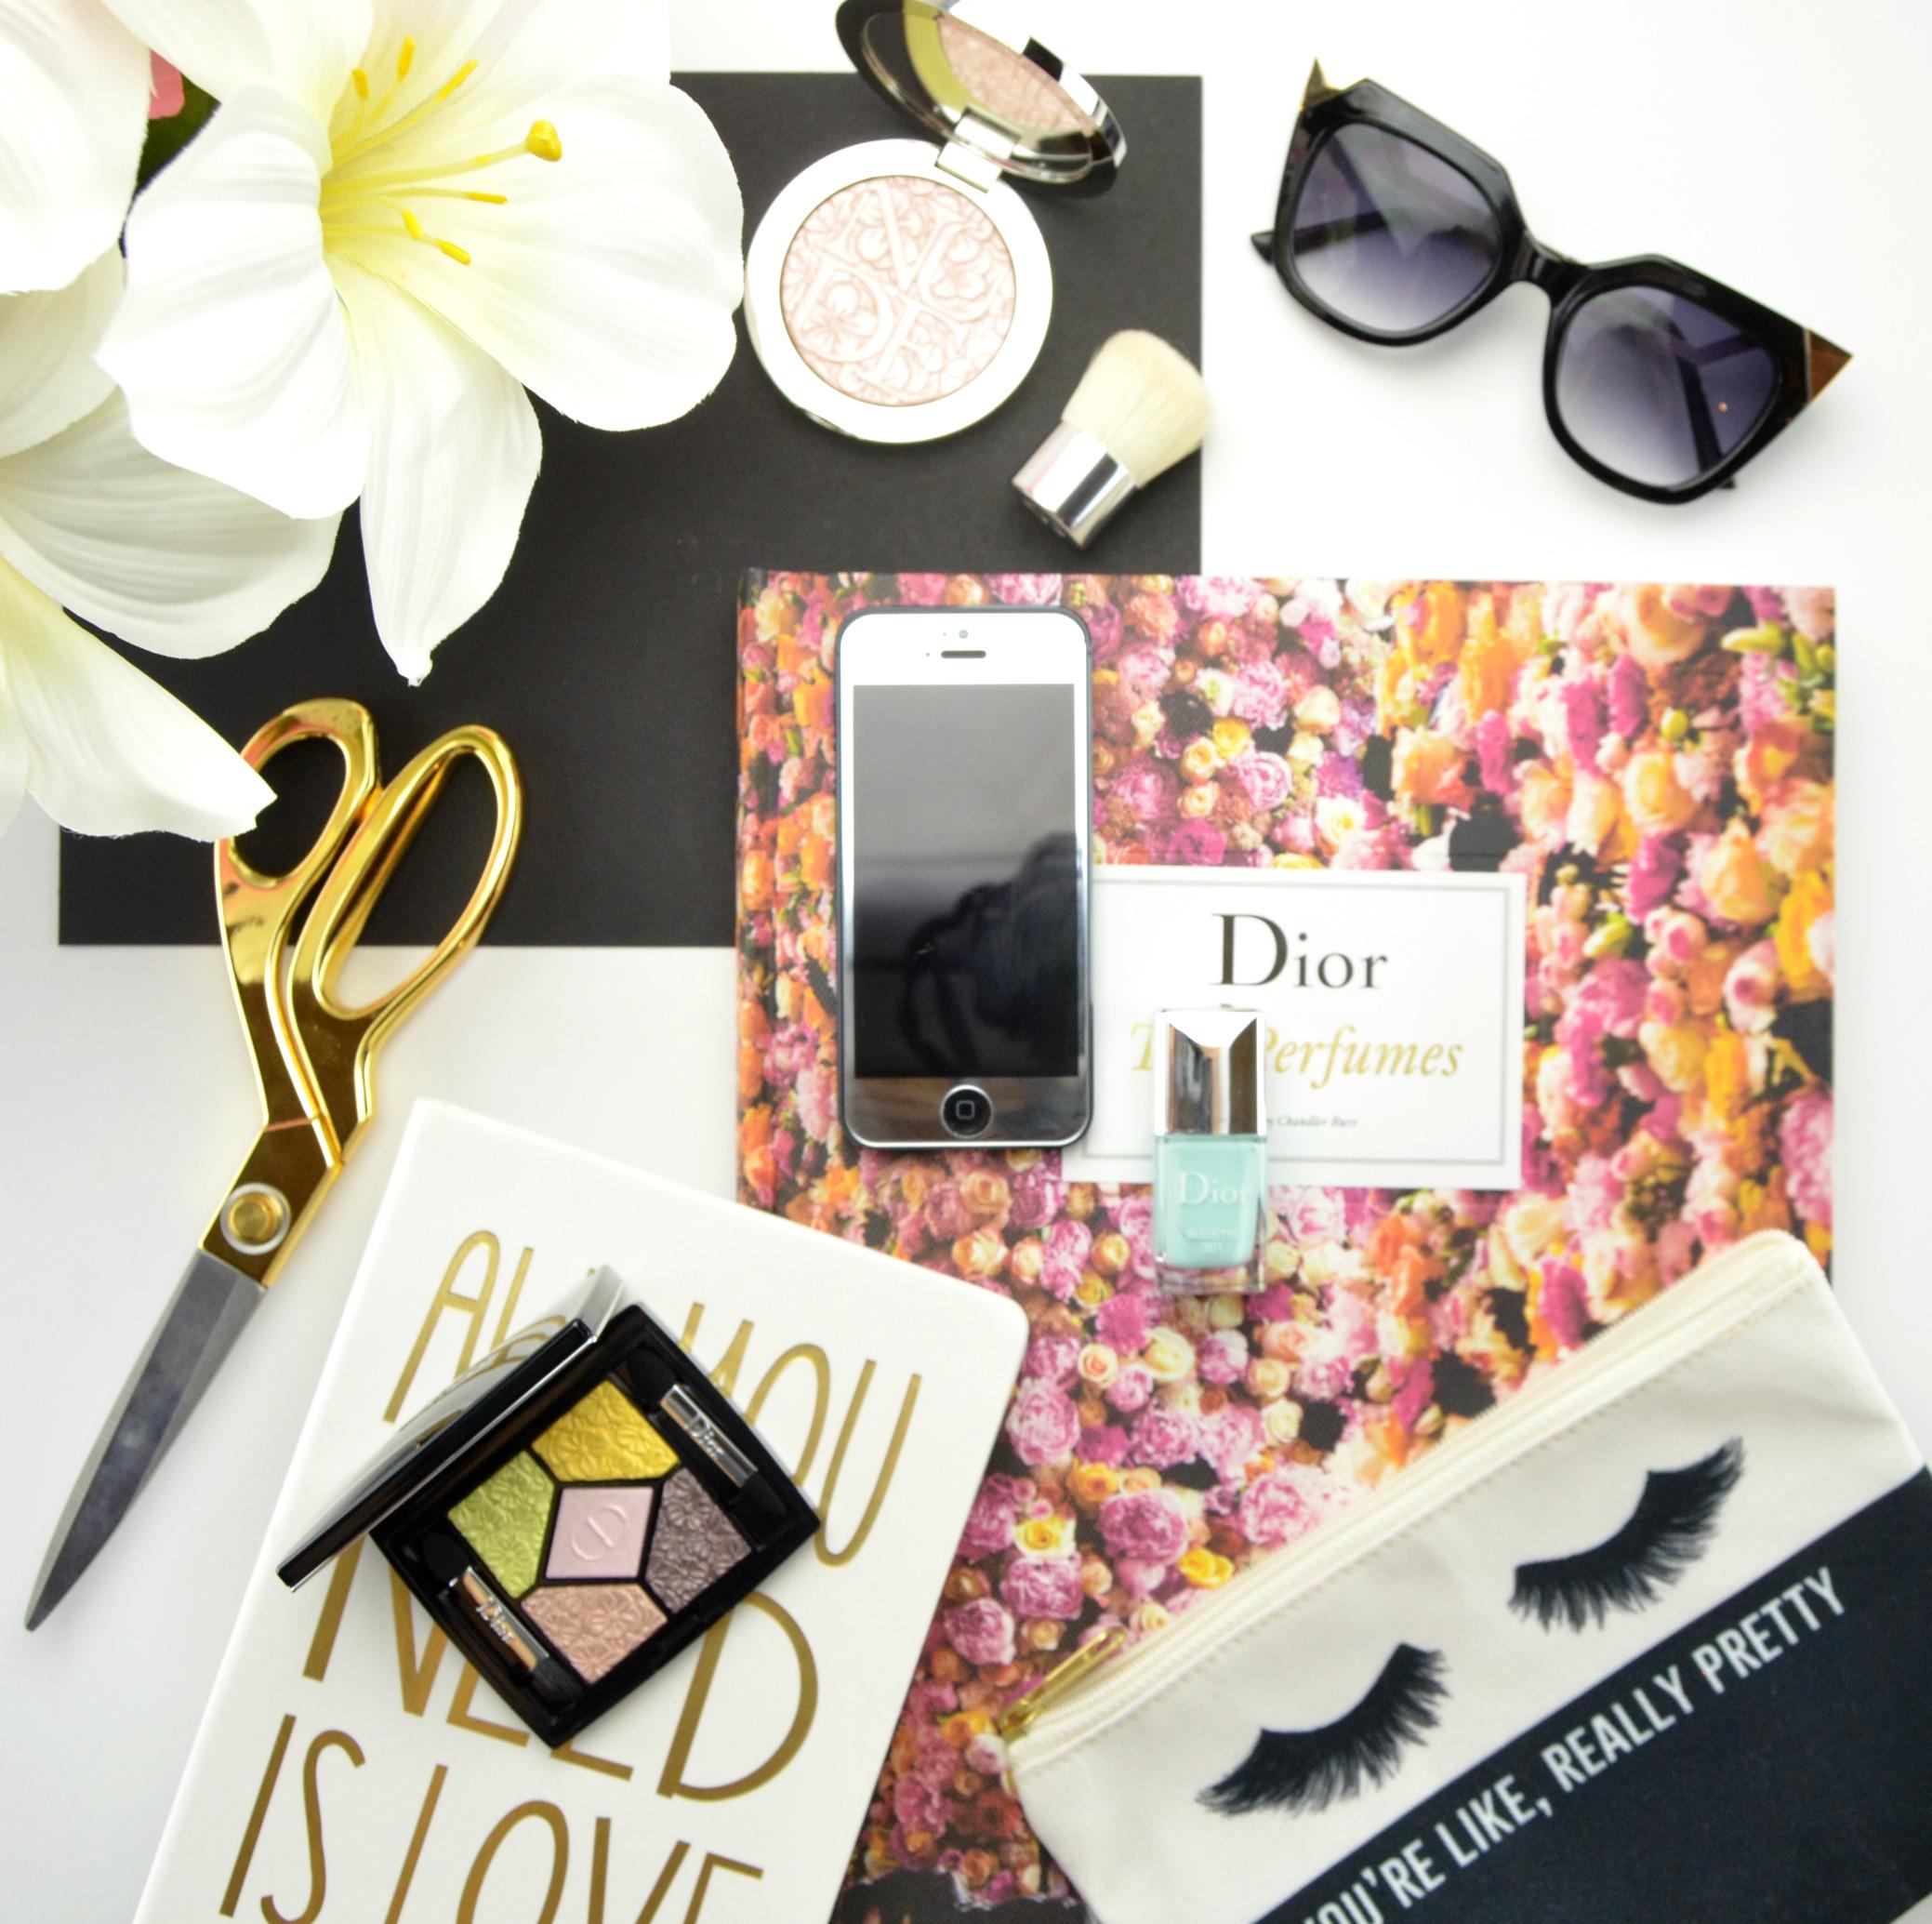 Dior Glowing Gardens (1)